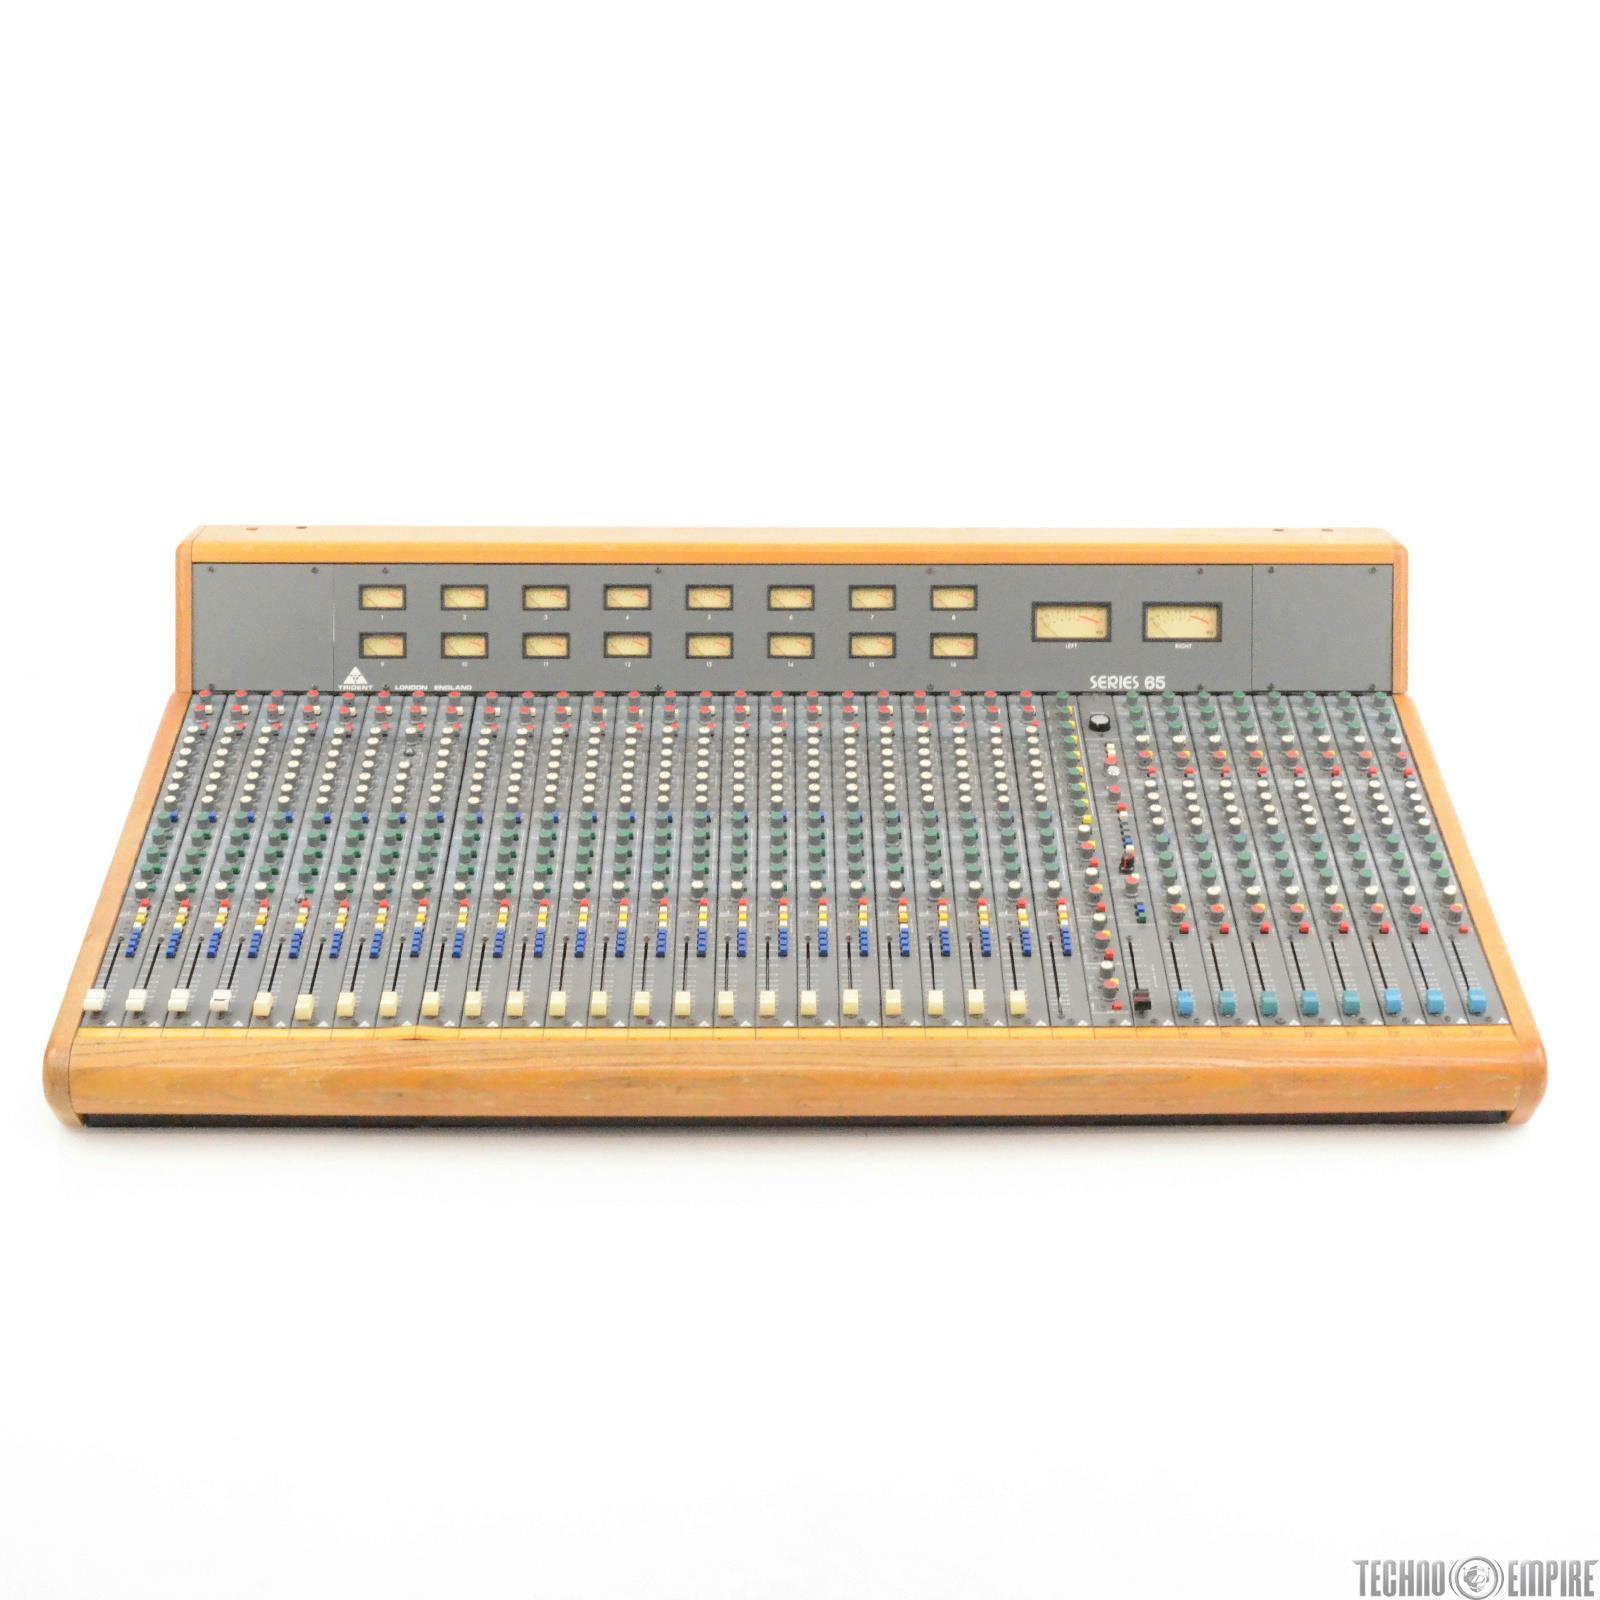 Trident Series 65 24x8x16 24 Channel Recording Mixer Console w/ PSU #29231